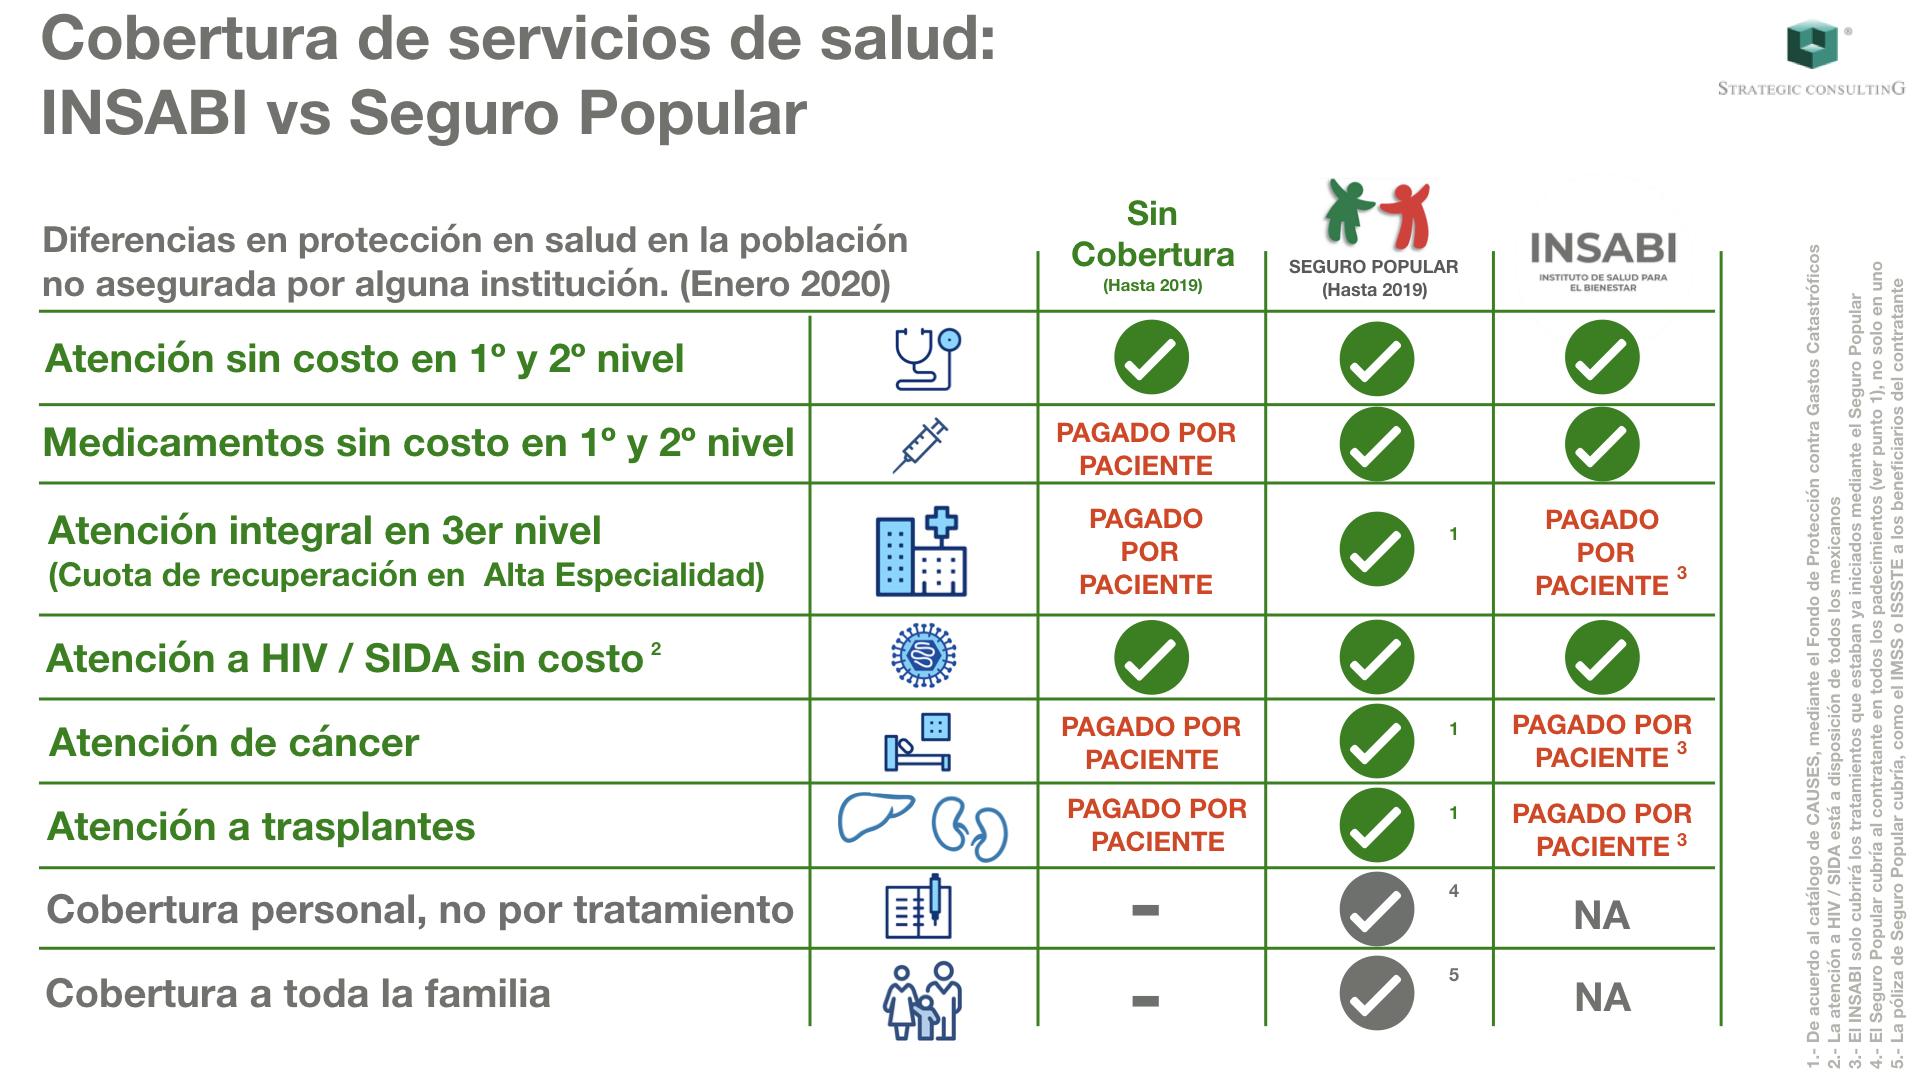 México: Izquierda, medicina costosa; Derecha, medicina gratis EOEHox1WsAUNn1h?format=jpg&name=large